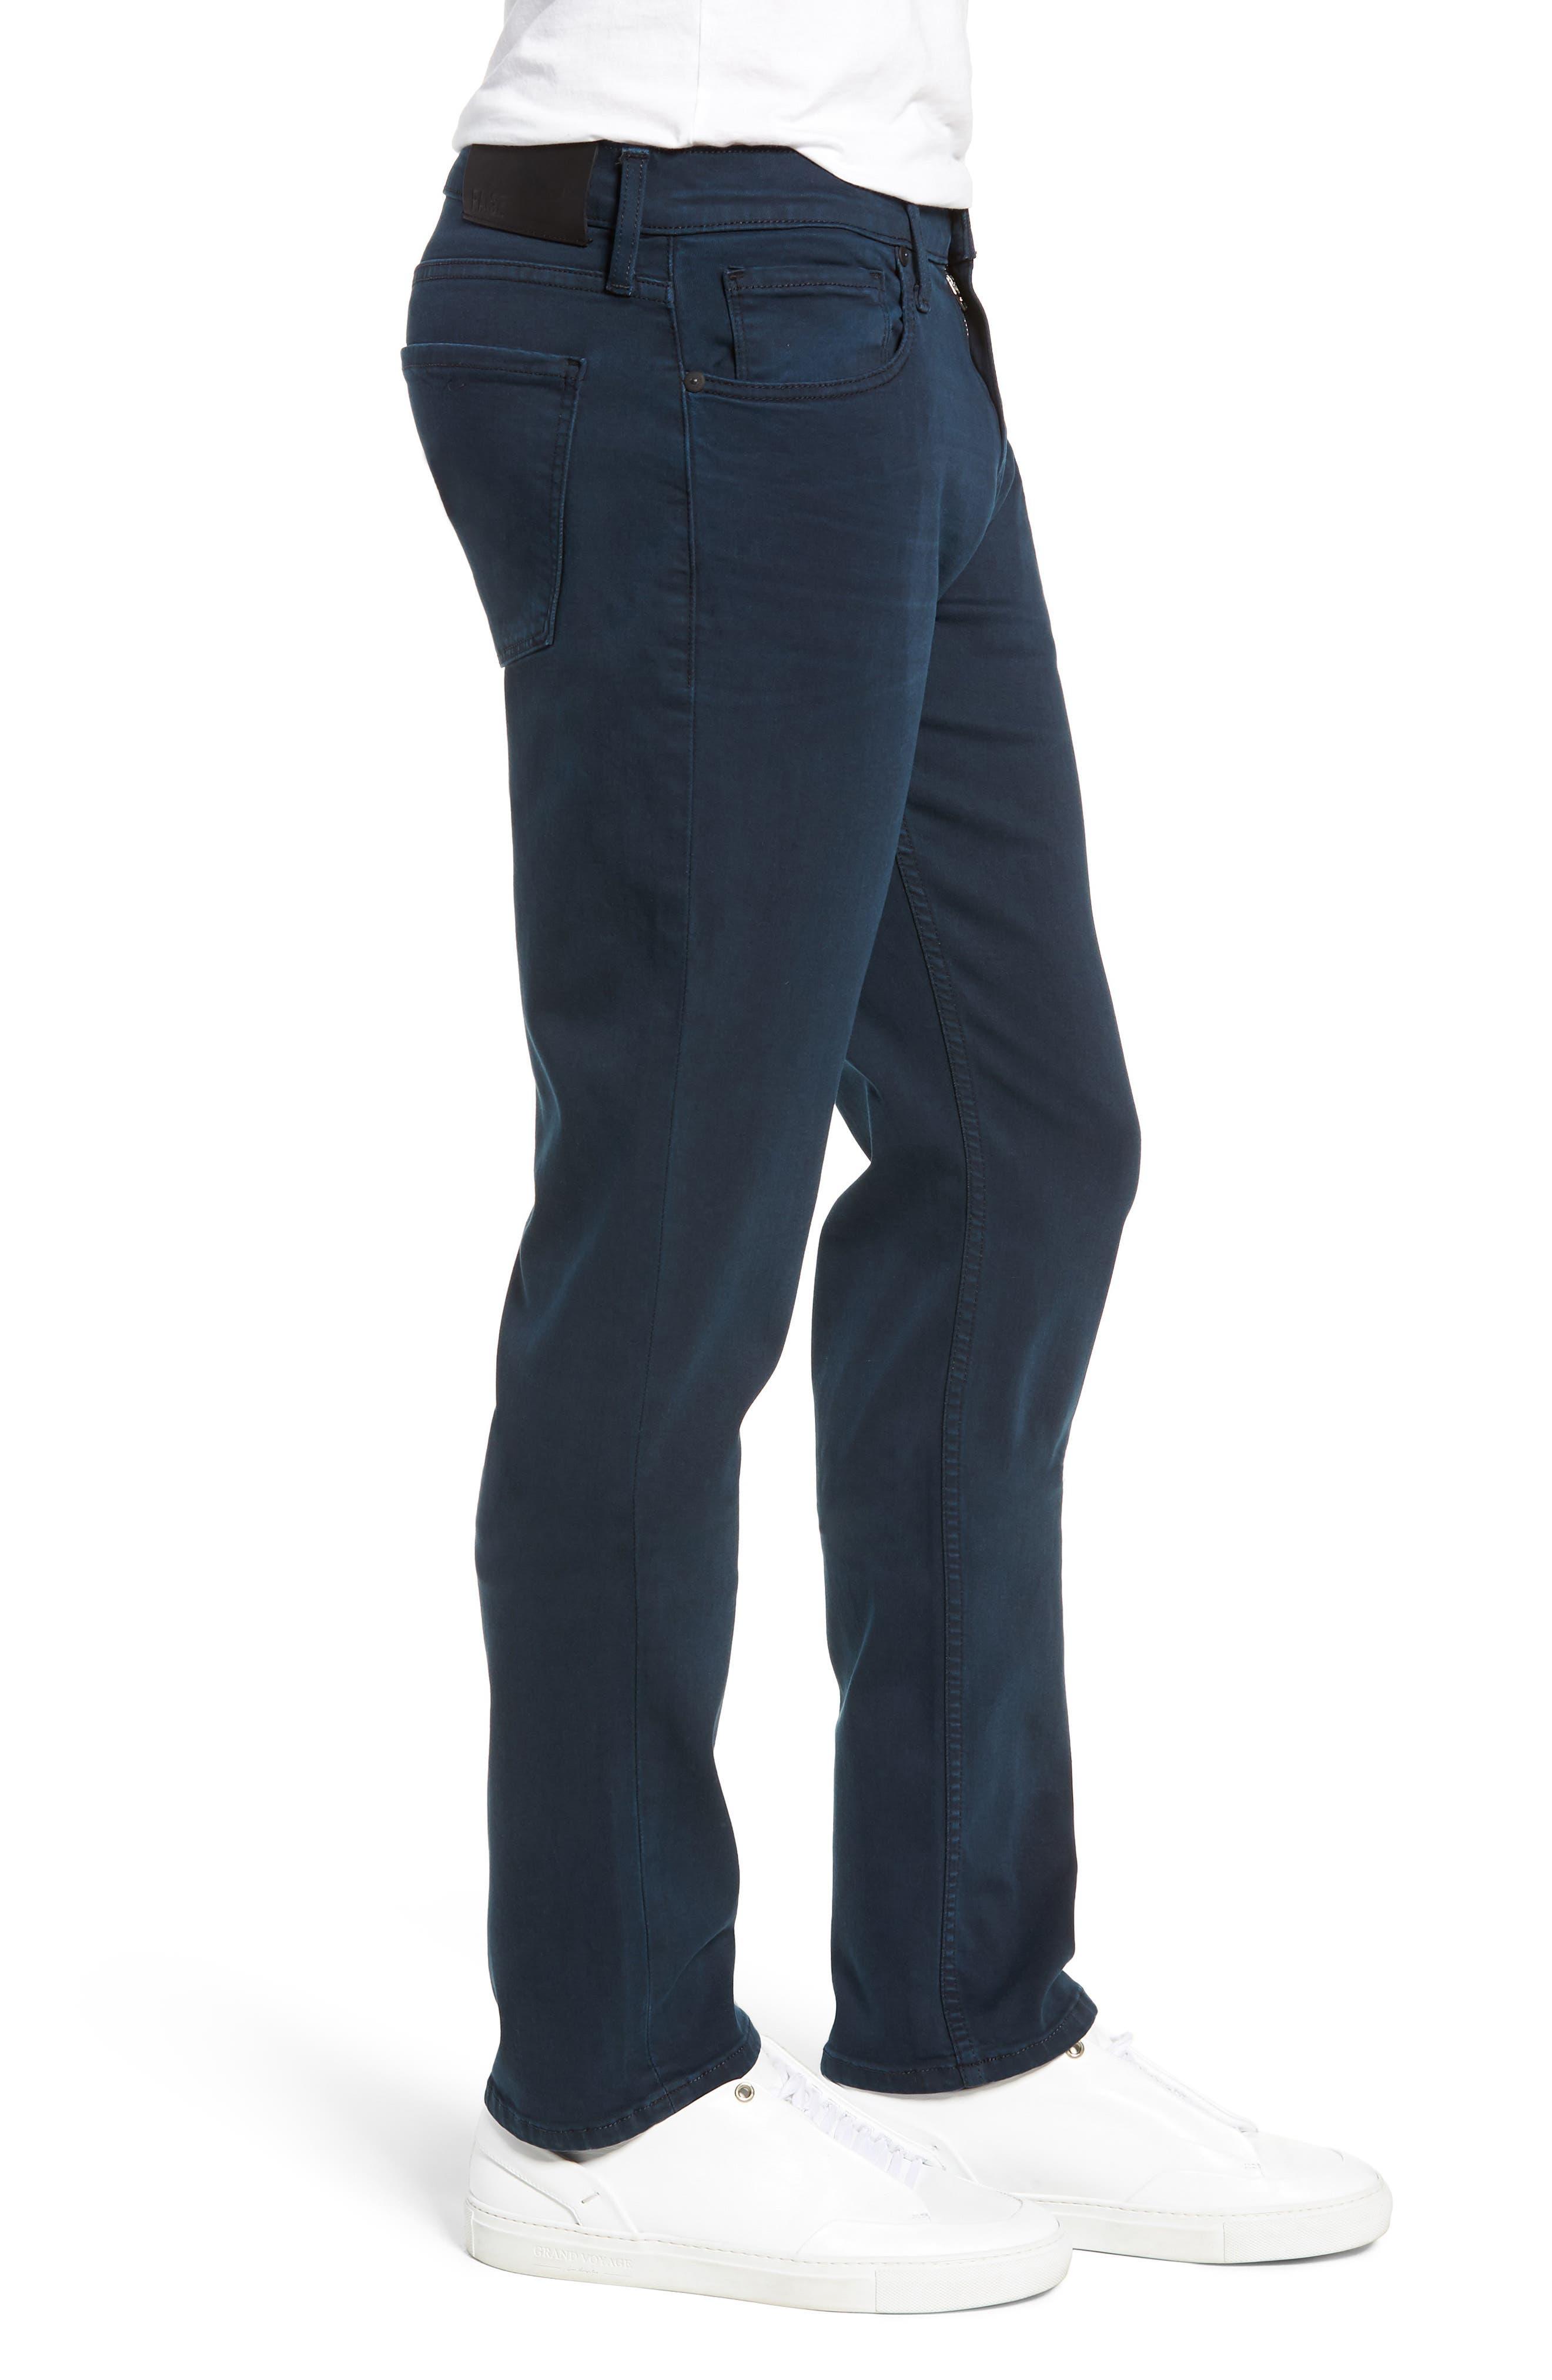 Transcend - Federal Slim Straight Leg Jeans,                             Alternate thumbnail 3, color,                             VINTAGE SKYFALL